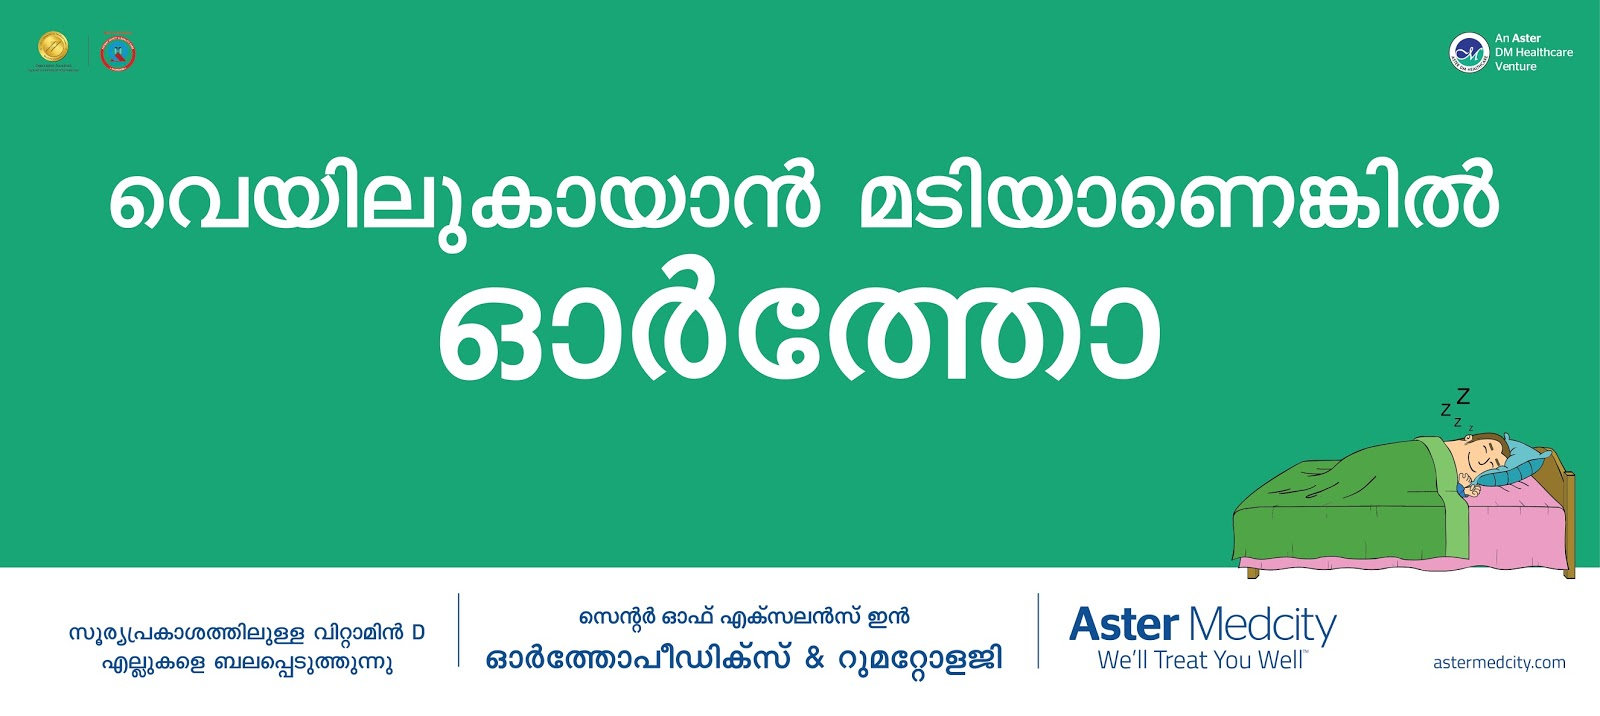 Aster Medcity - 24x7 Ortho Surgery | Print mock-up 5 | Stark Communications Pvt Ltd